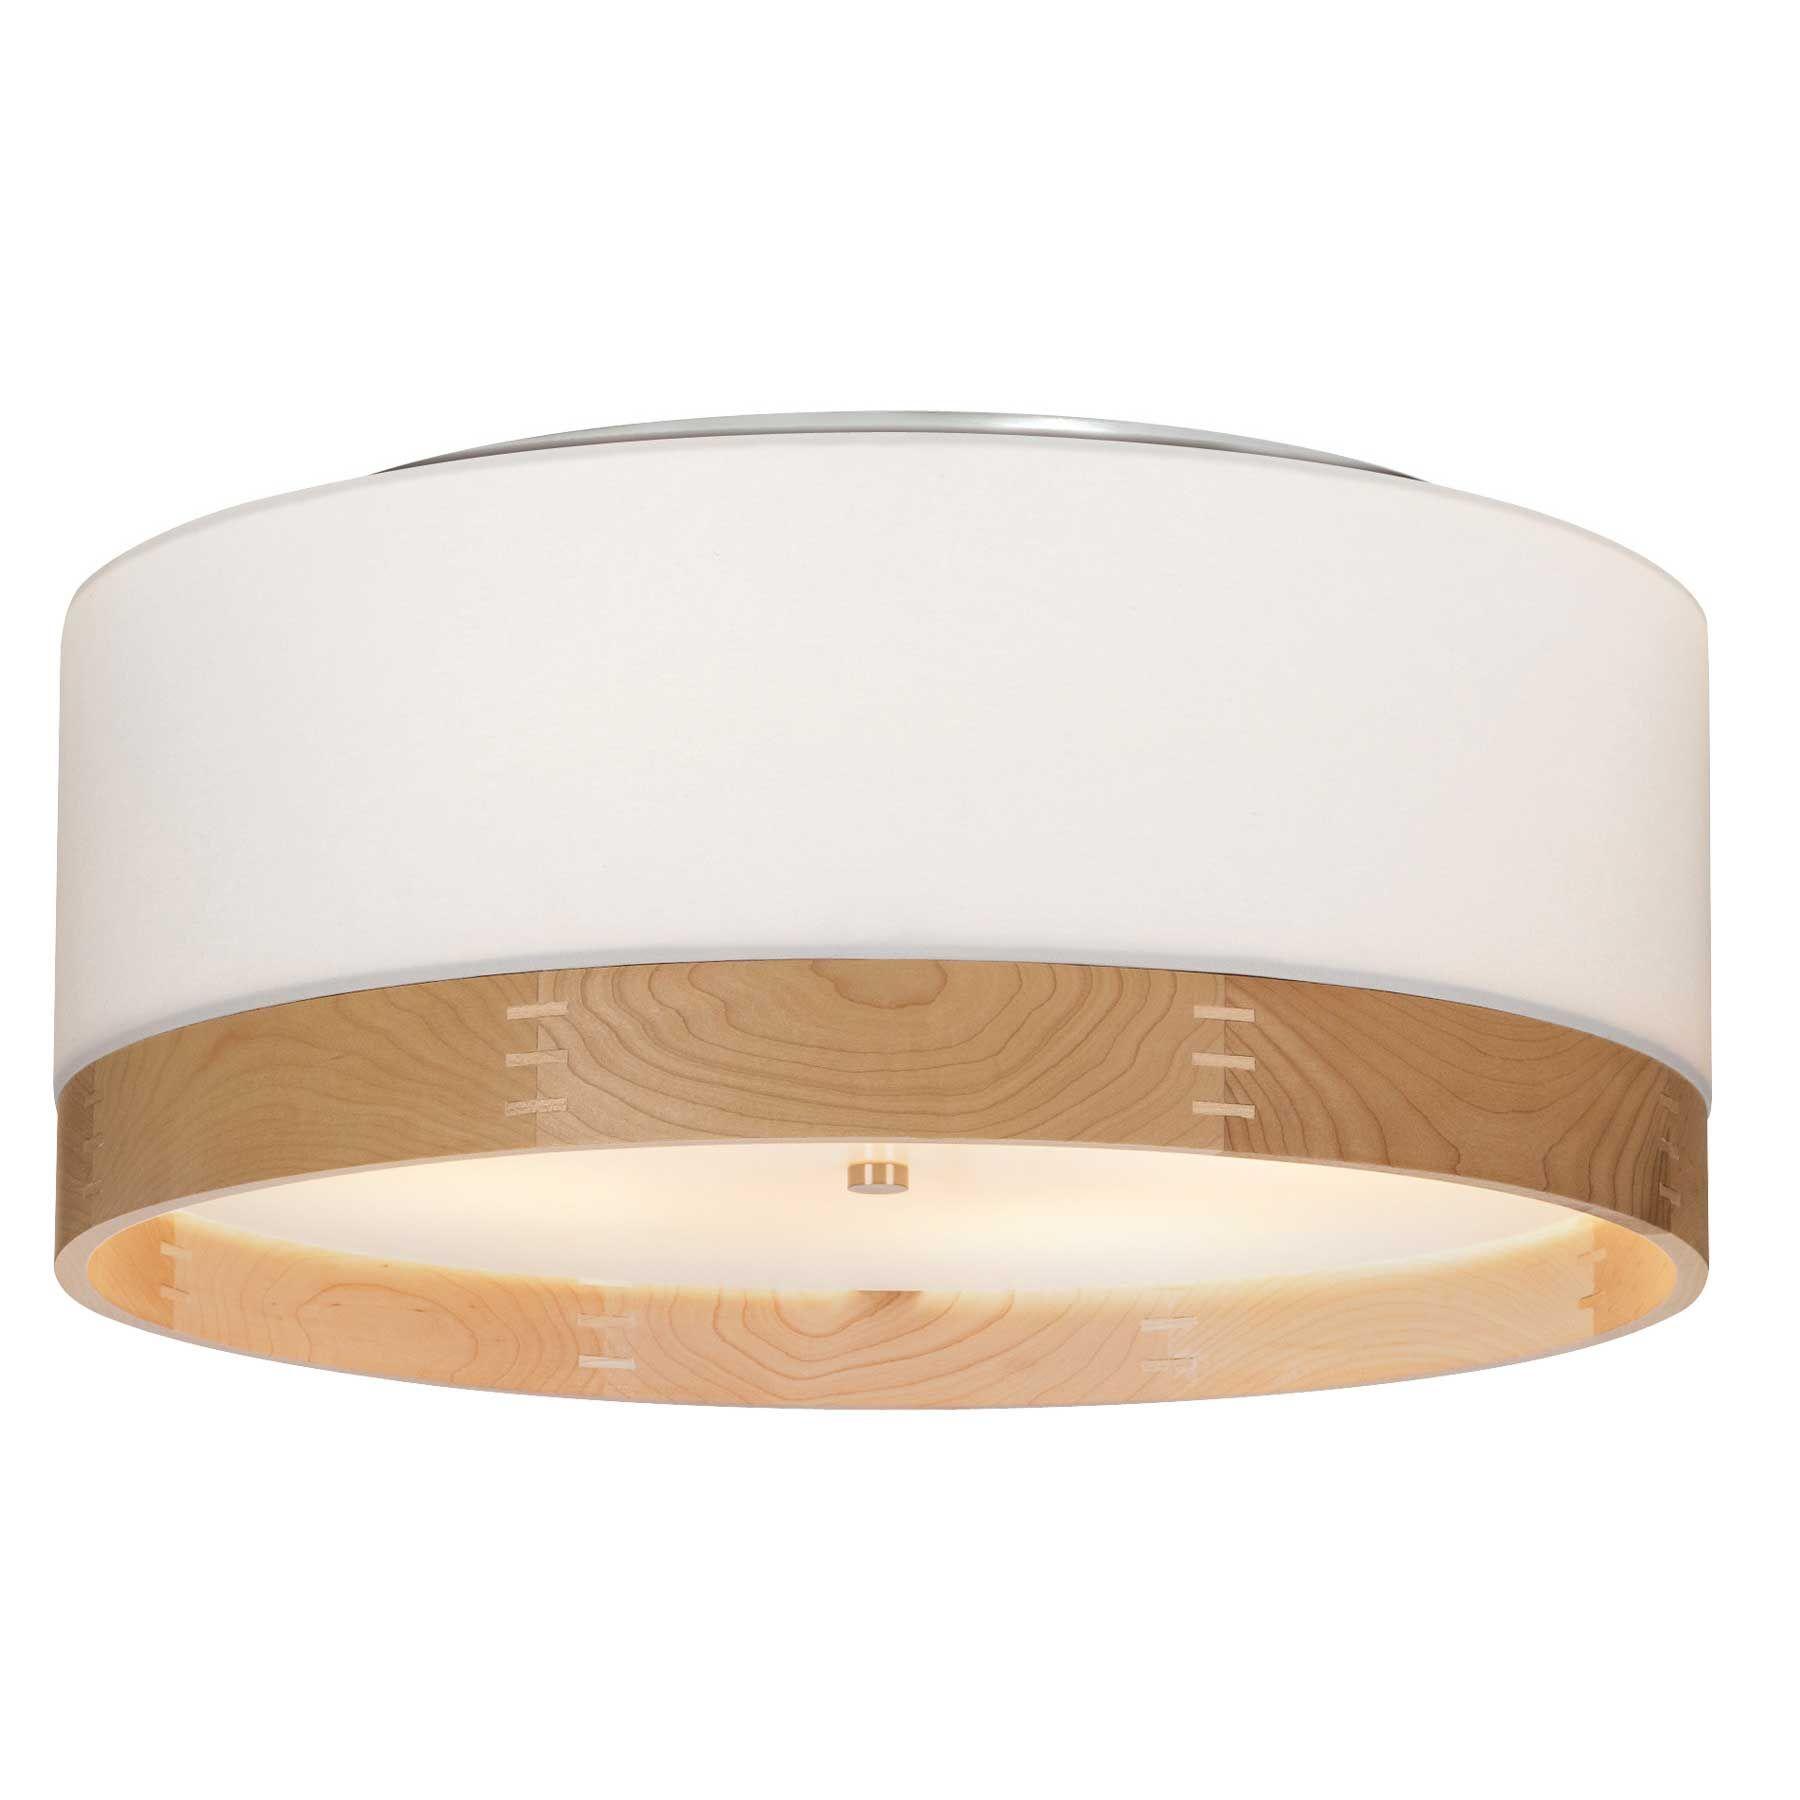 Topo Flush Mount Ceiling Light features a modern drum